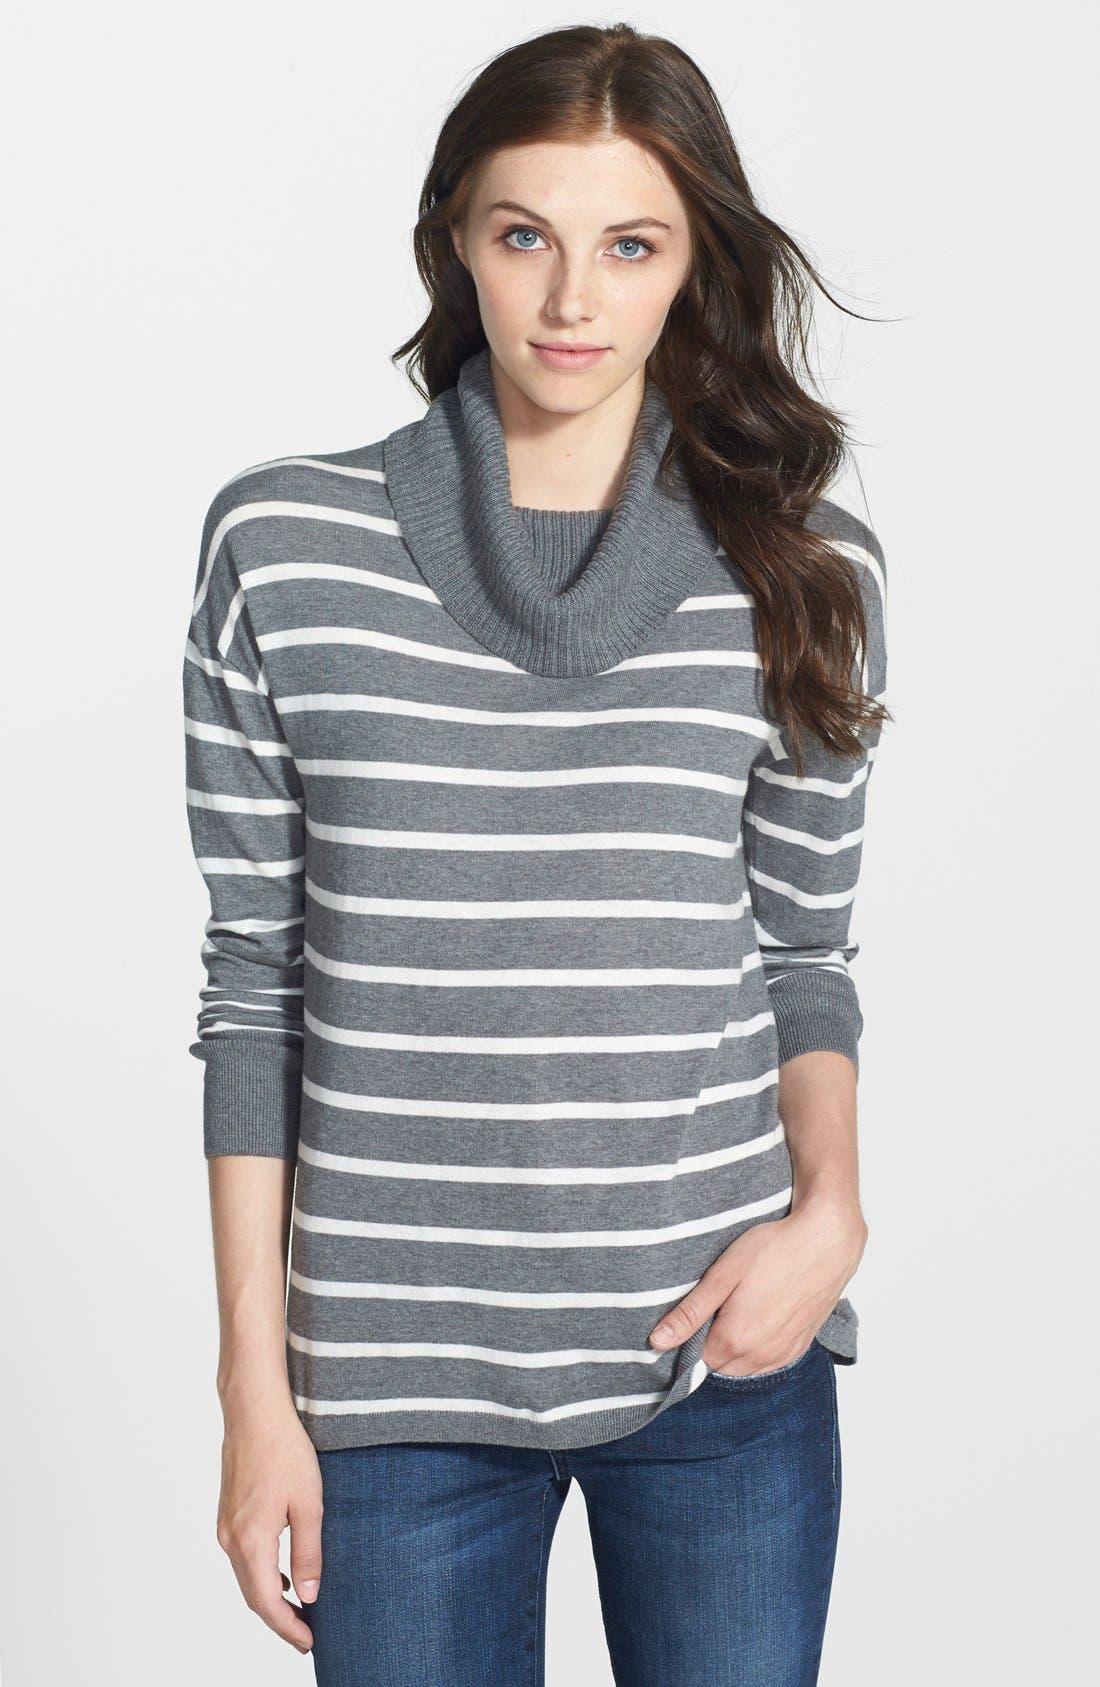 Alternate Image 1 Selected - Halogen® Relaxed Turtleneck Tunic Sweater (Regular & Petite)